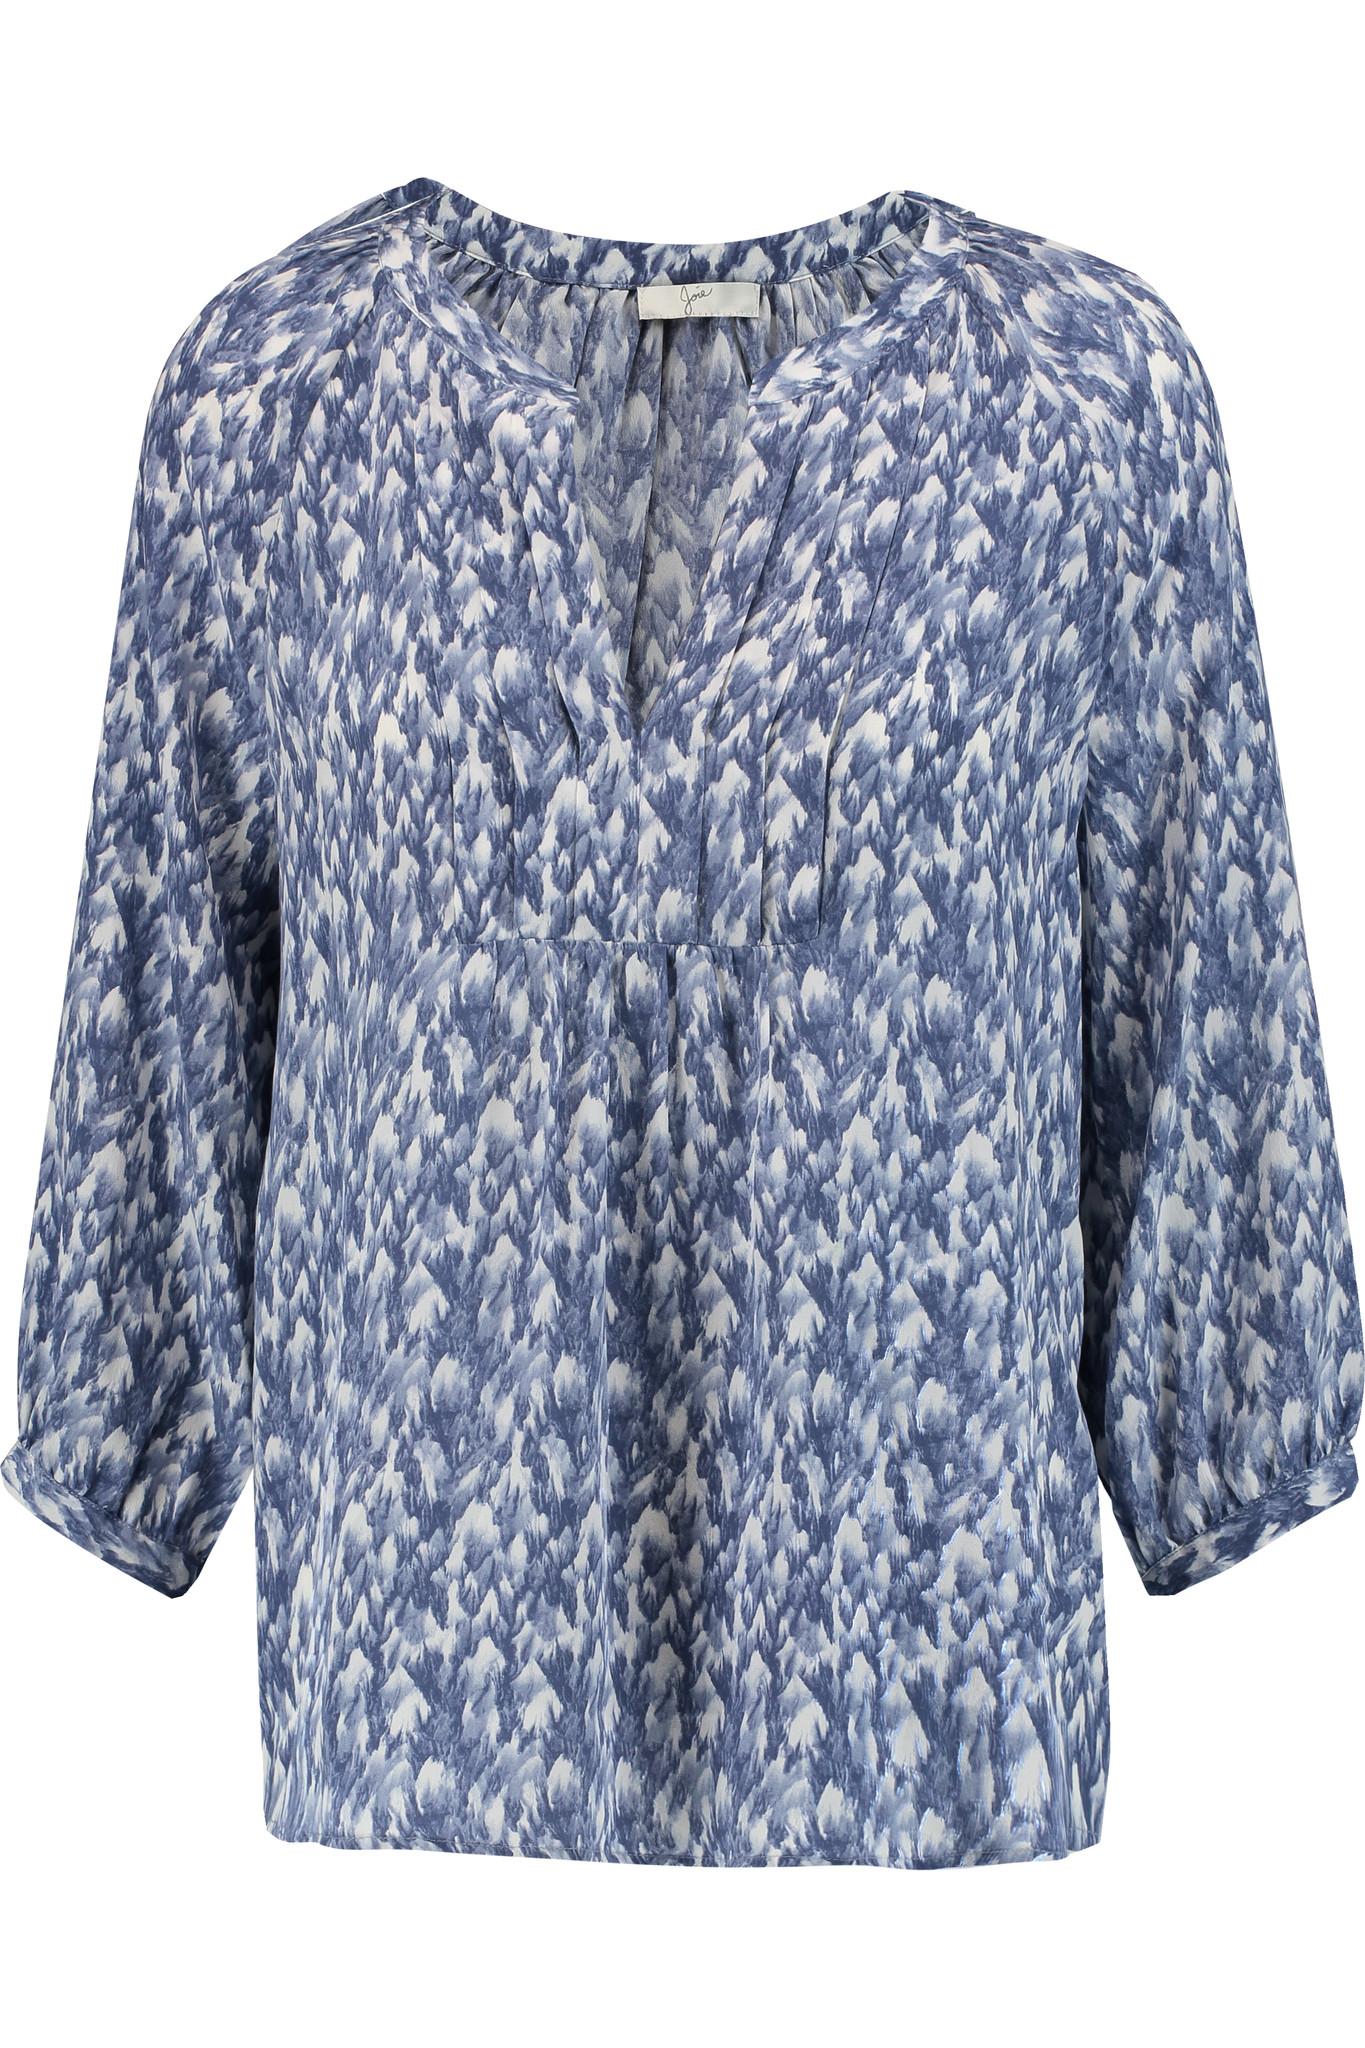 Joie Blue Silk Blouse 33